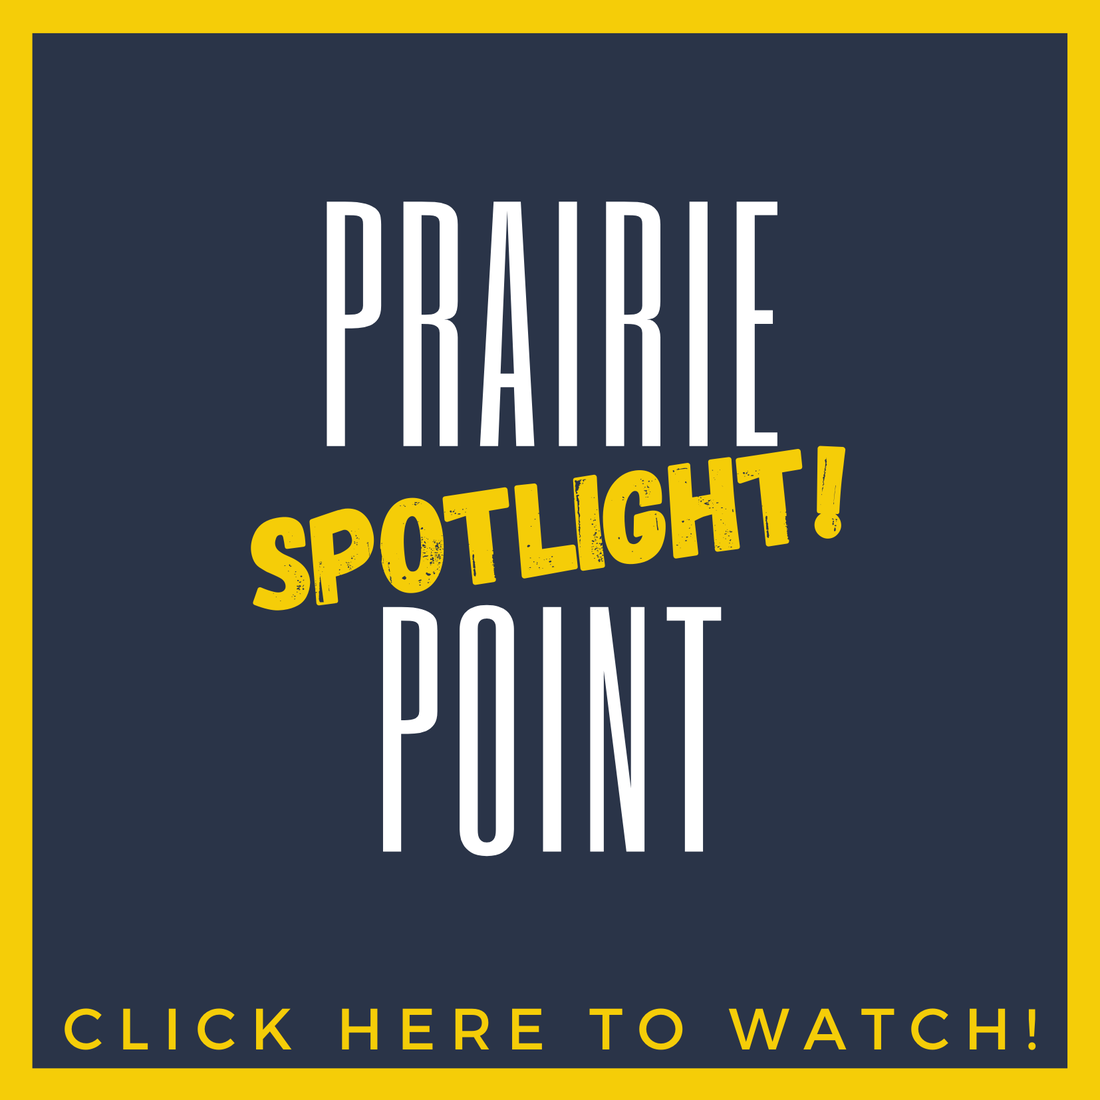 Prairie Point Spotlight 2020